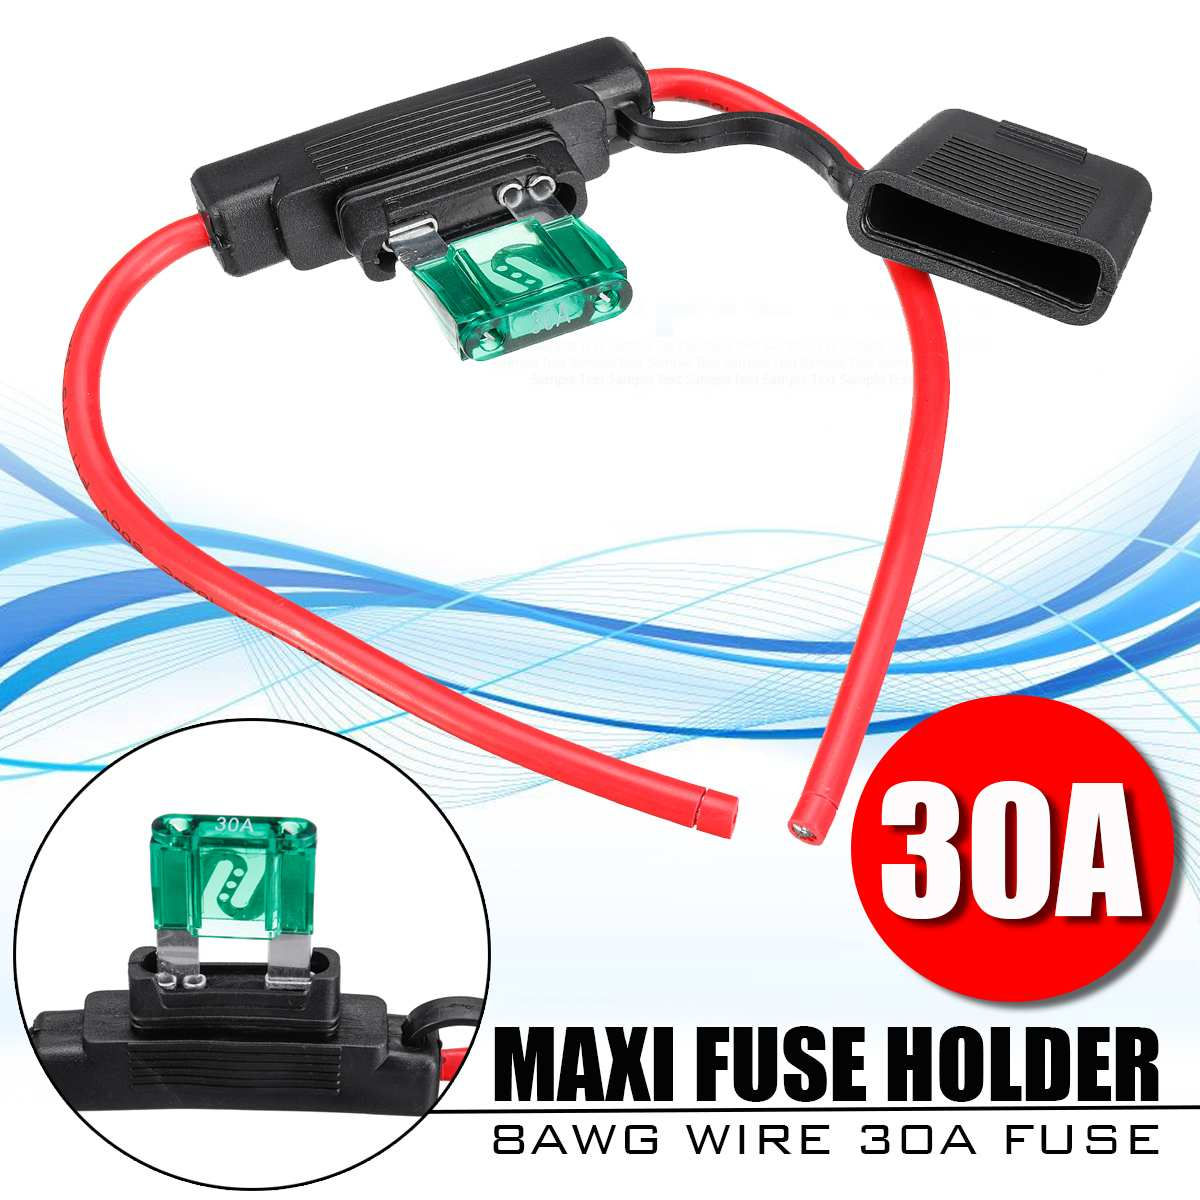 8awg automático à prova de intempéries inline lâmina fusível titular caixa maxi 30amp 8b & s fio + 30a fusível kit